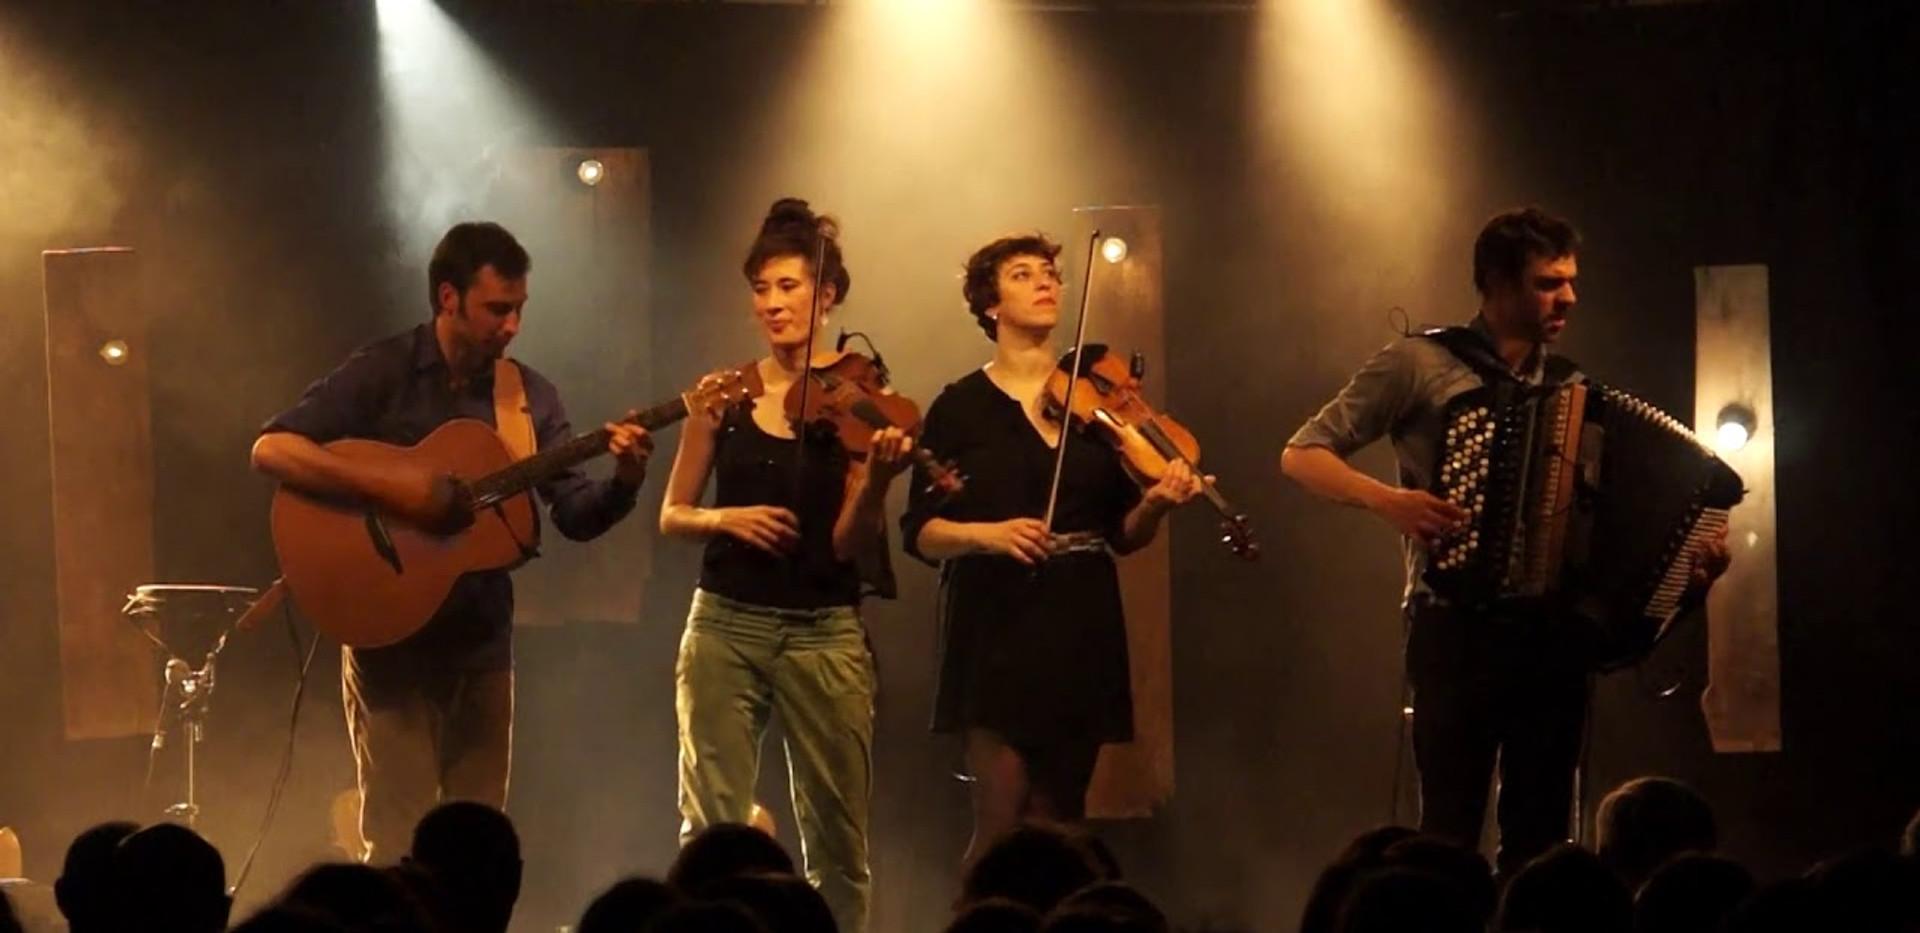 Zakouska concert